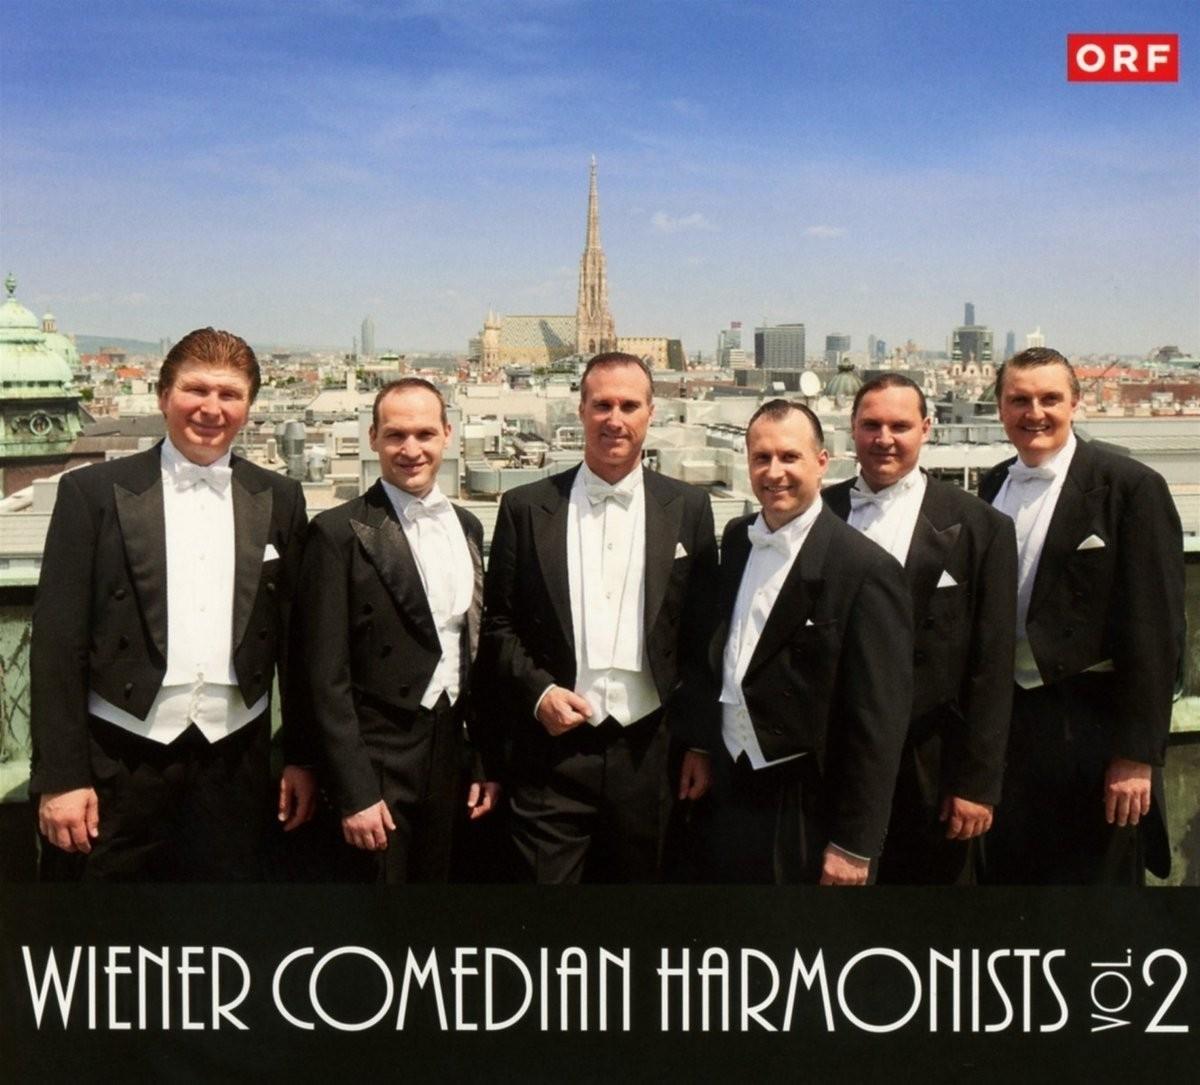 Musik CD Cover der 2. CD der Wiener Comedian Harmonists